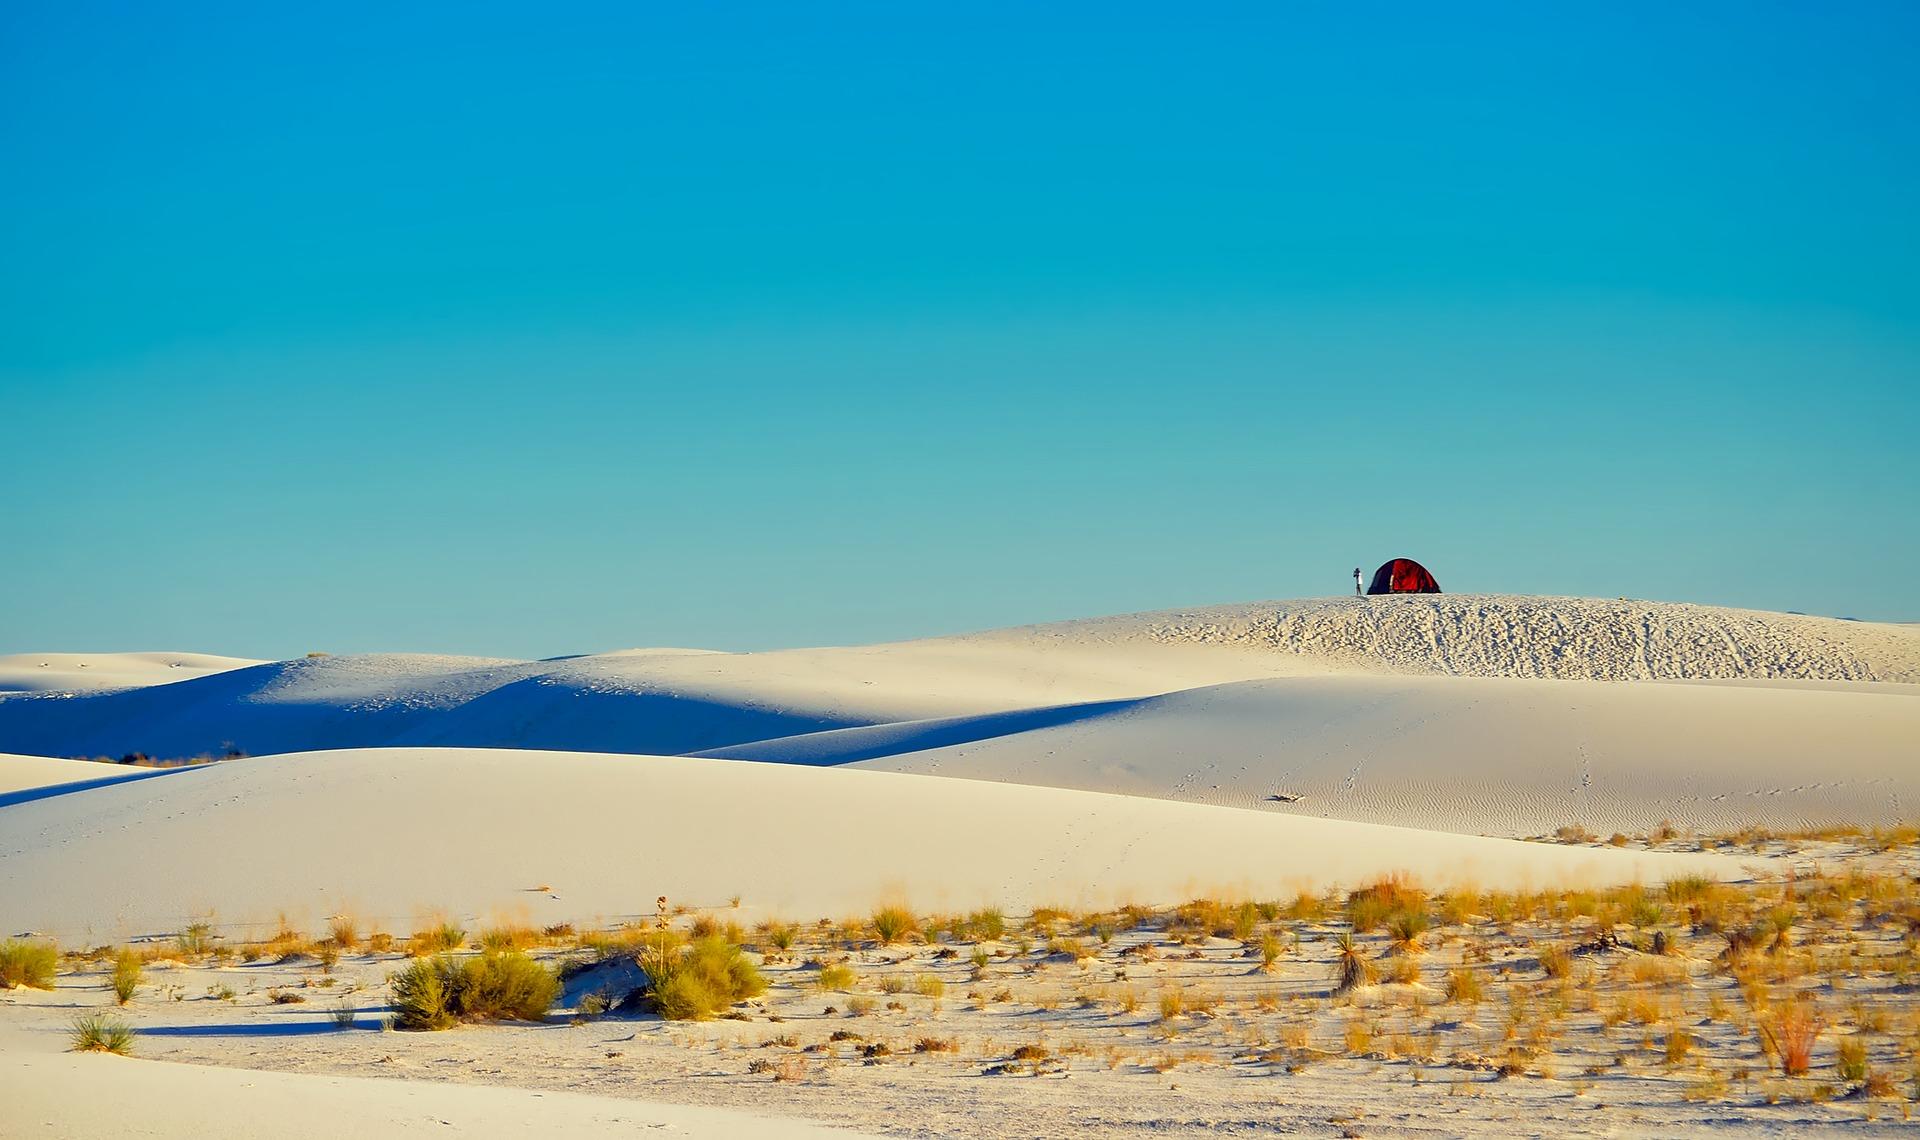 white-sands-national-monument-1911395_1920